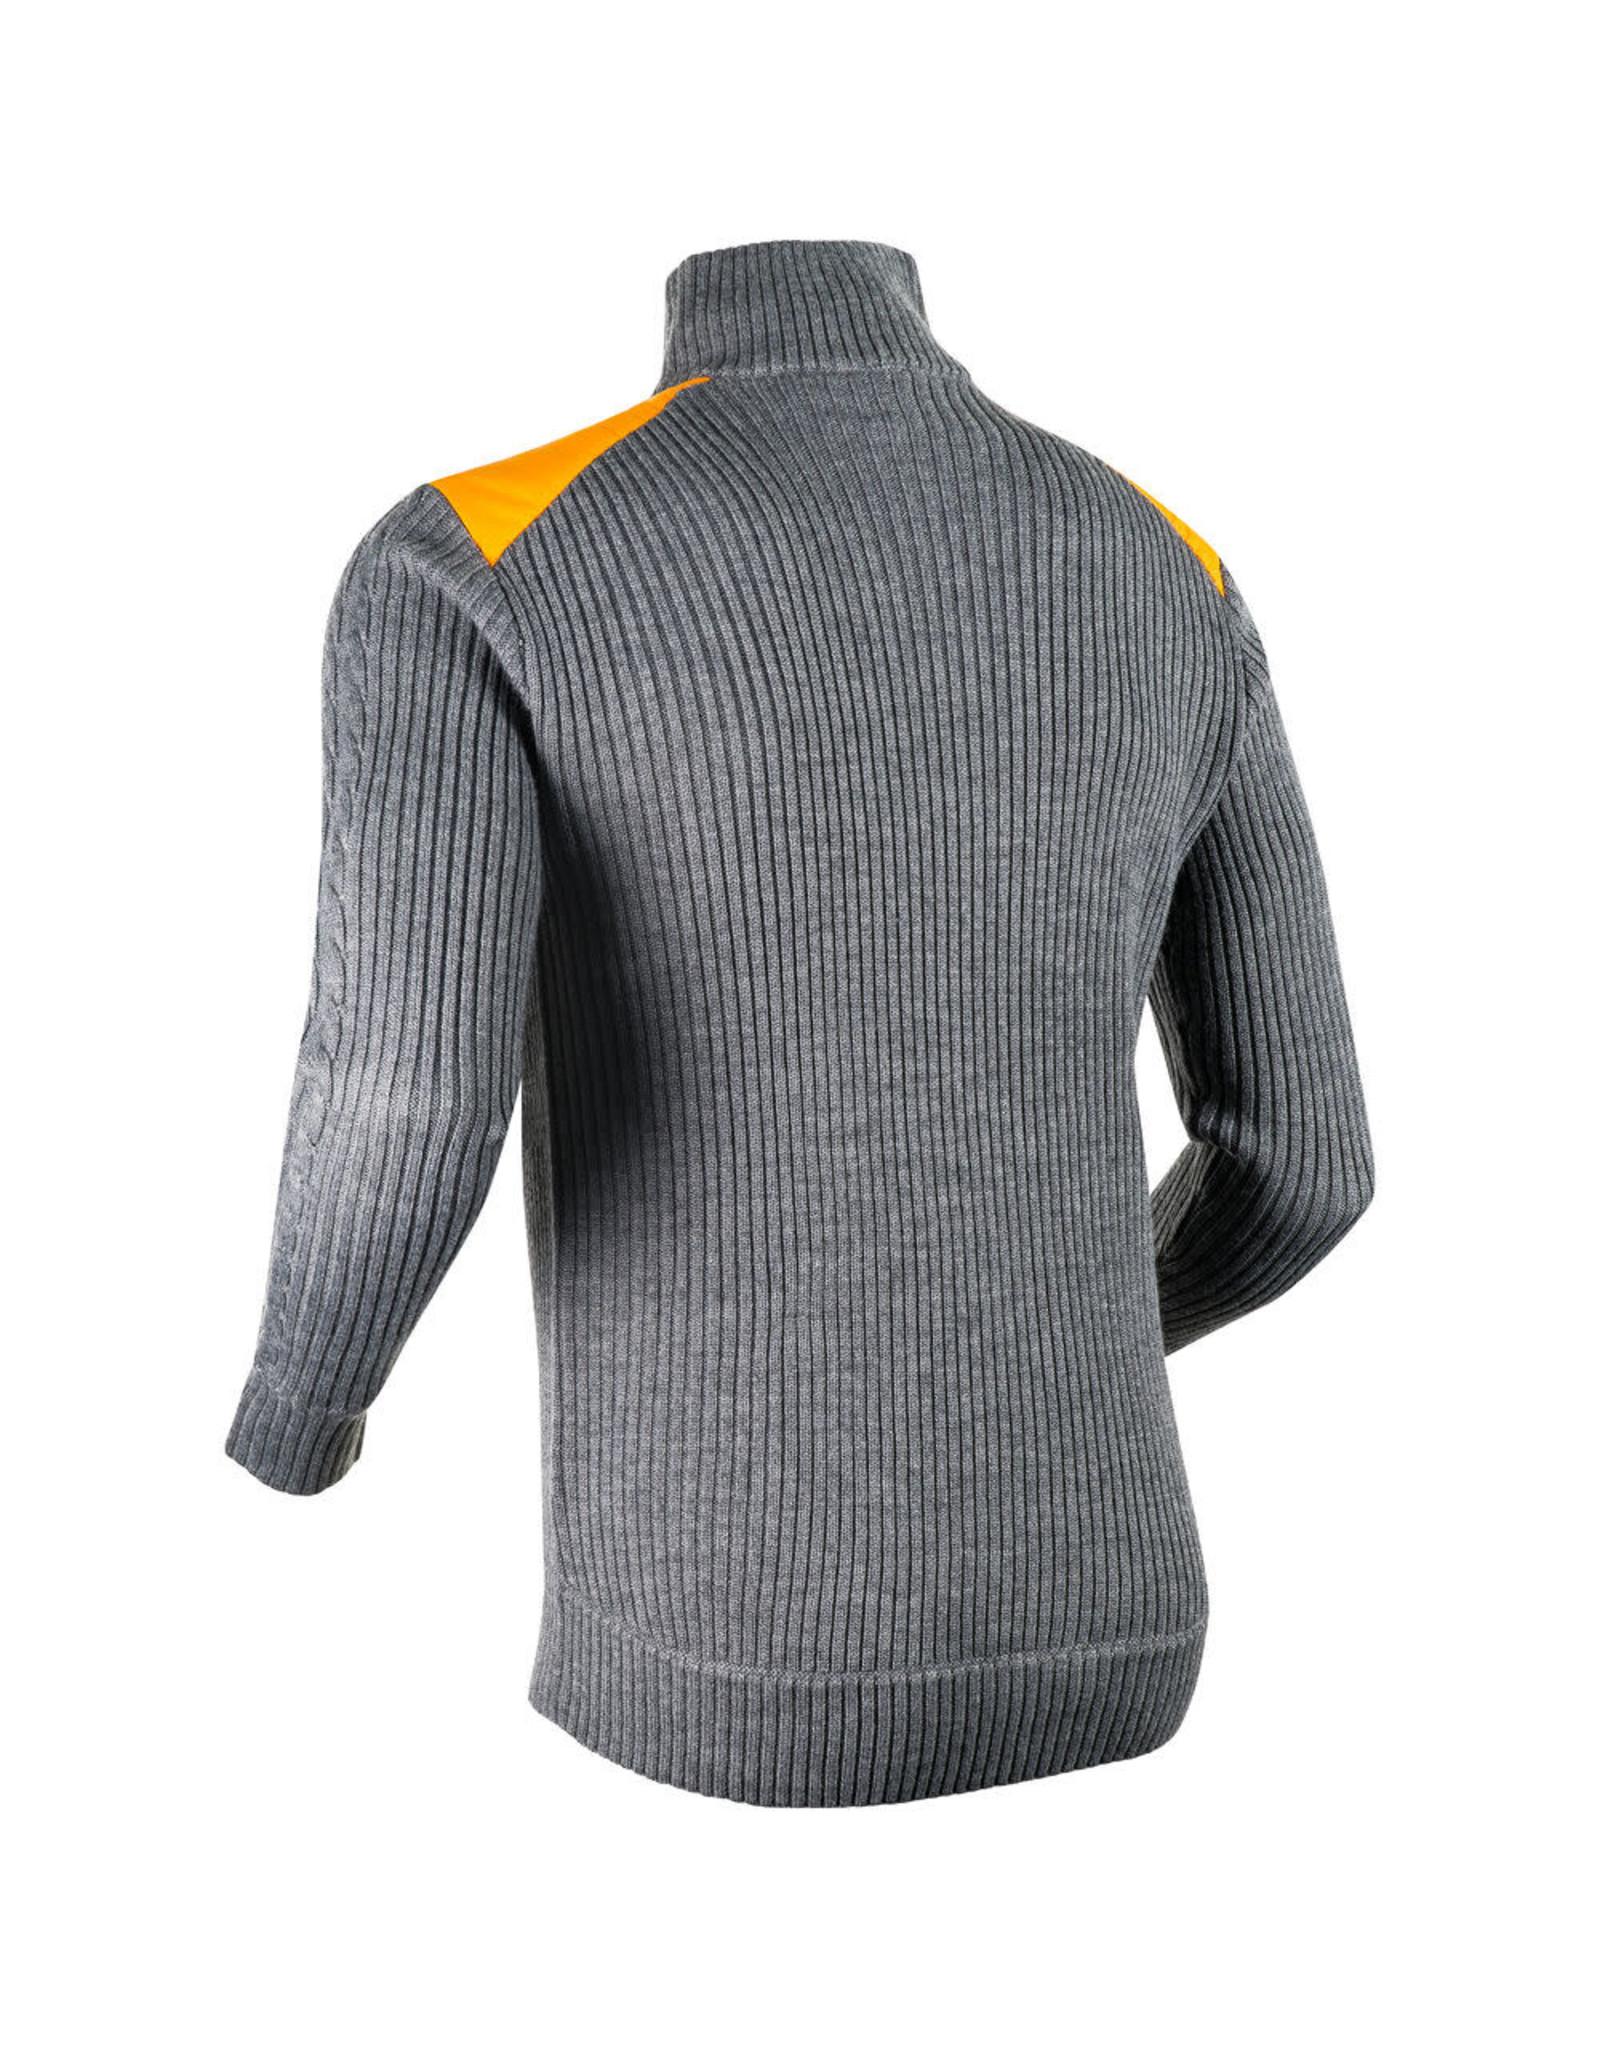 Bjorn Daehlie Bjorn Daehlie Sweater Half Zip Comfy Men's